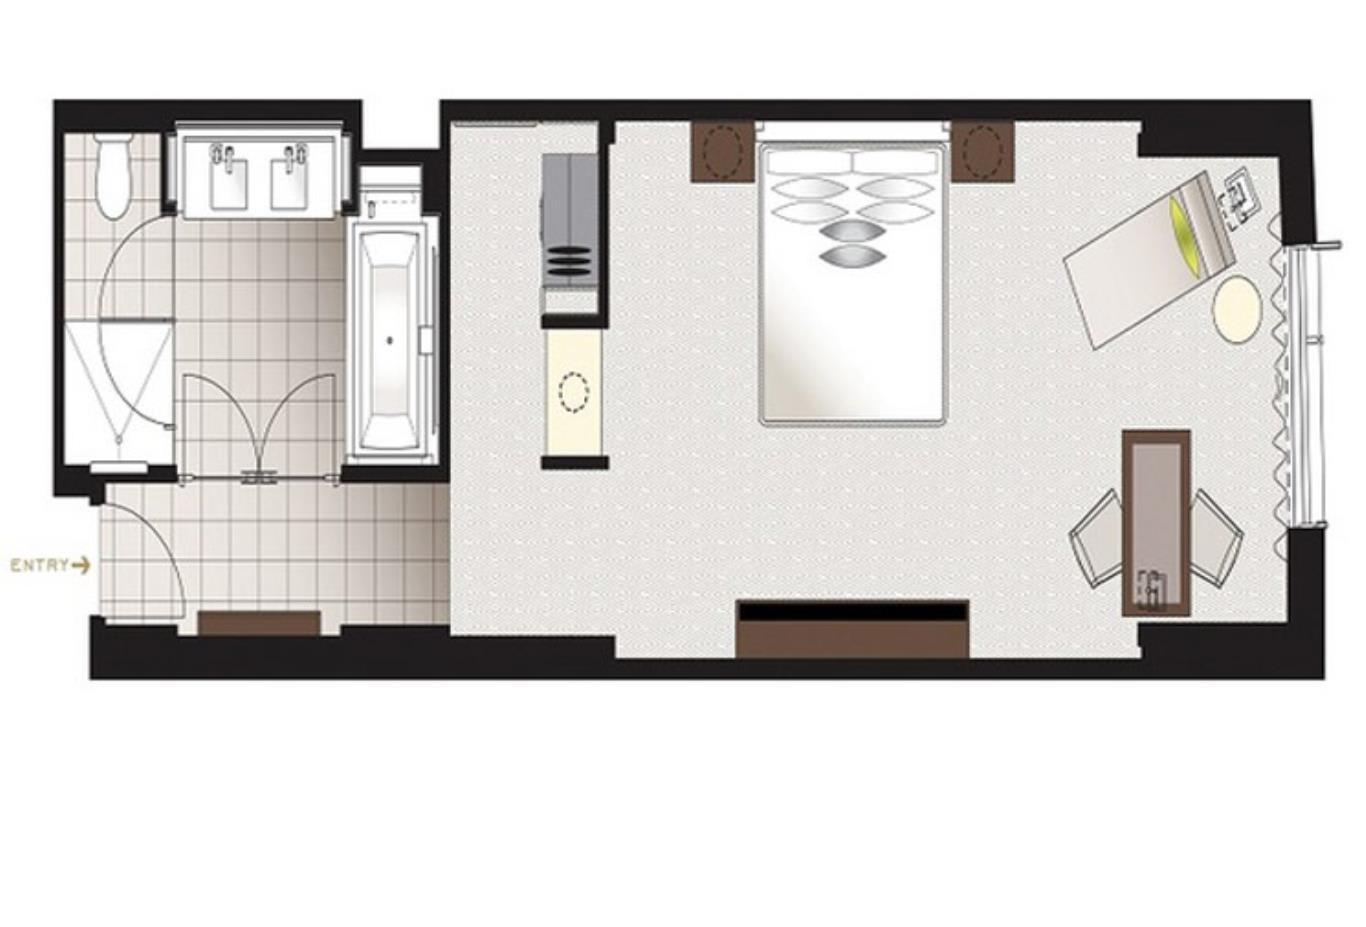 Premier Room Floorplan